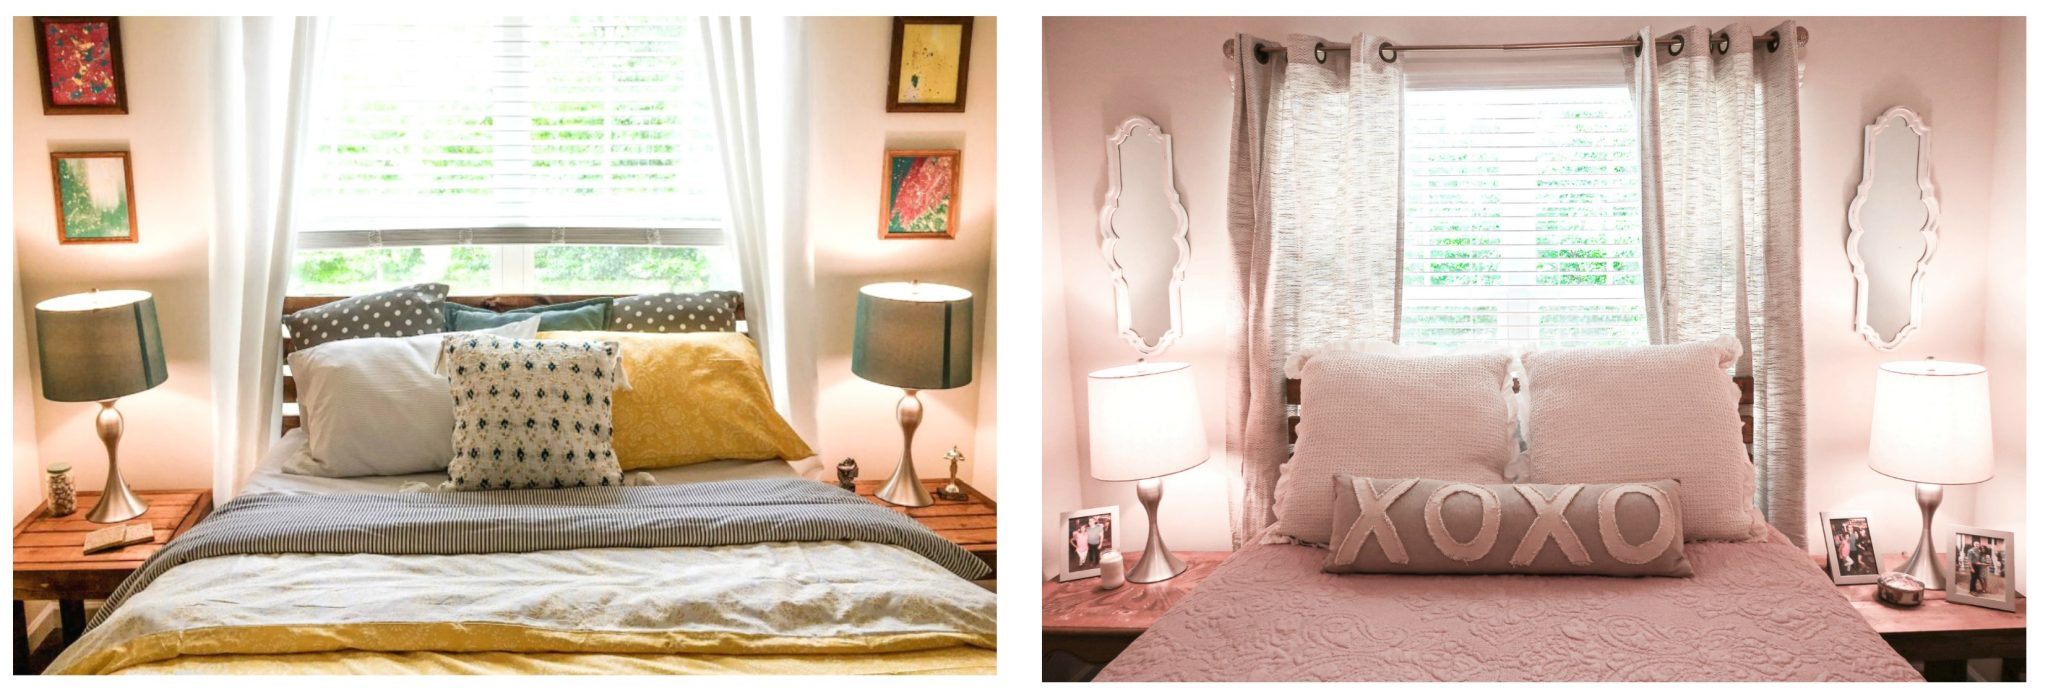 home remodel, room, makeover, cozy home decor, cozy guest bedroom, cozy bedroom, xo xo, soft pink room